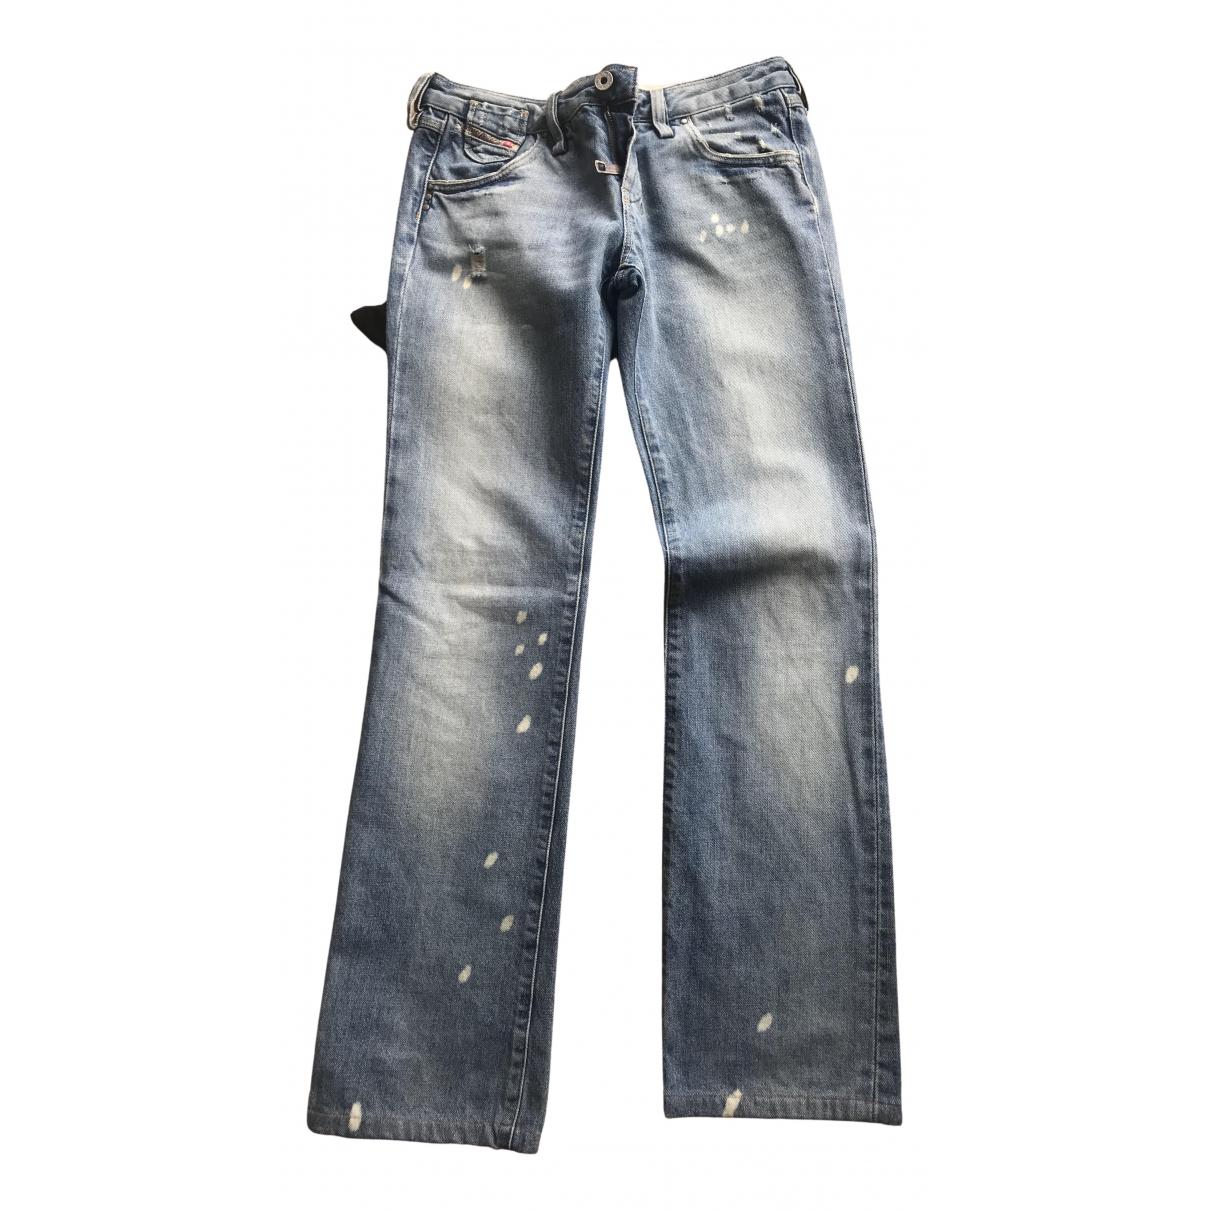 Diesel N Turquoise Denim - Jeans Jeans for Women 27 US